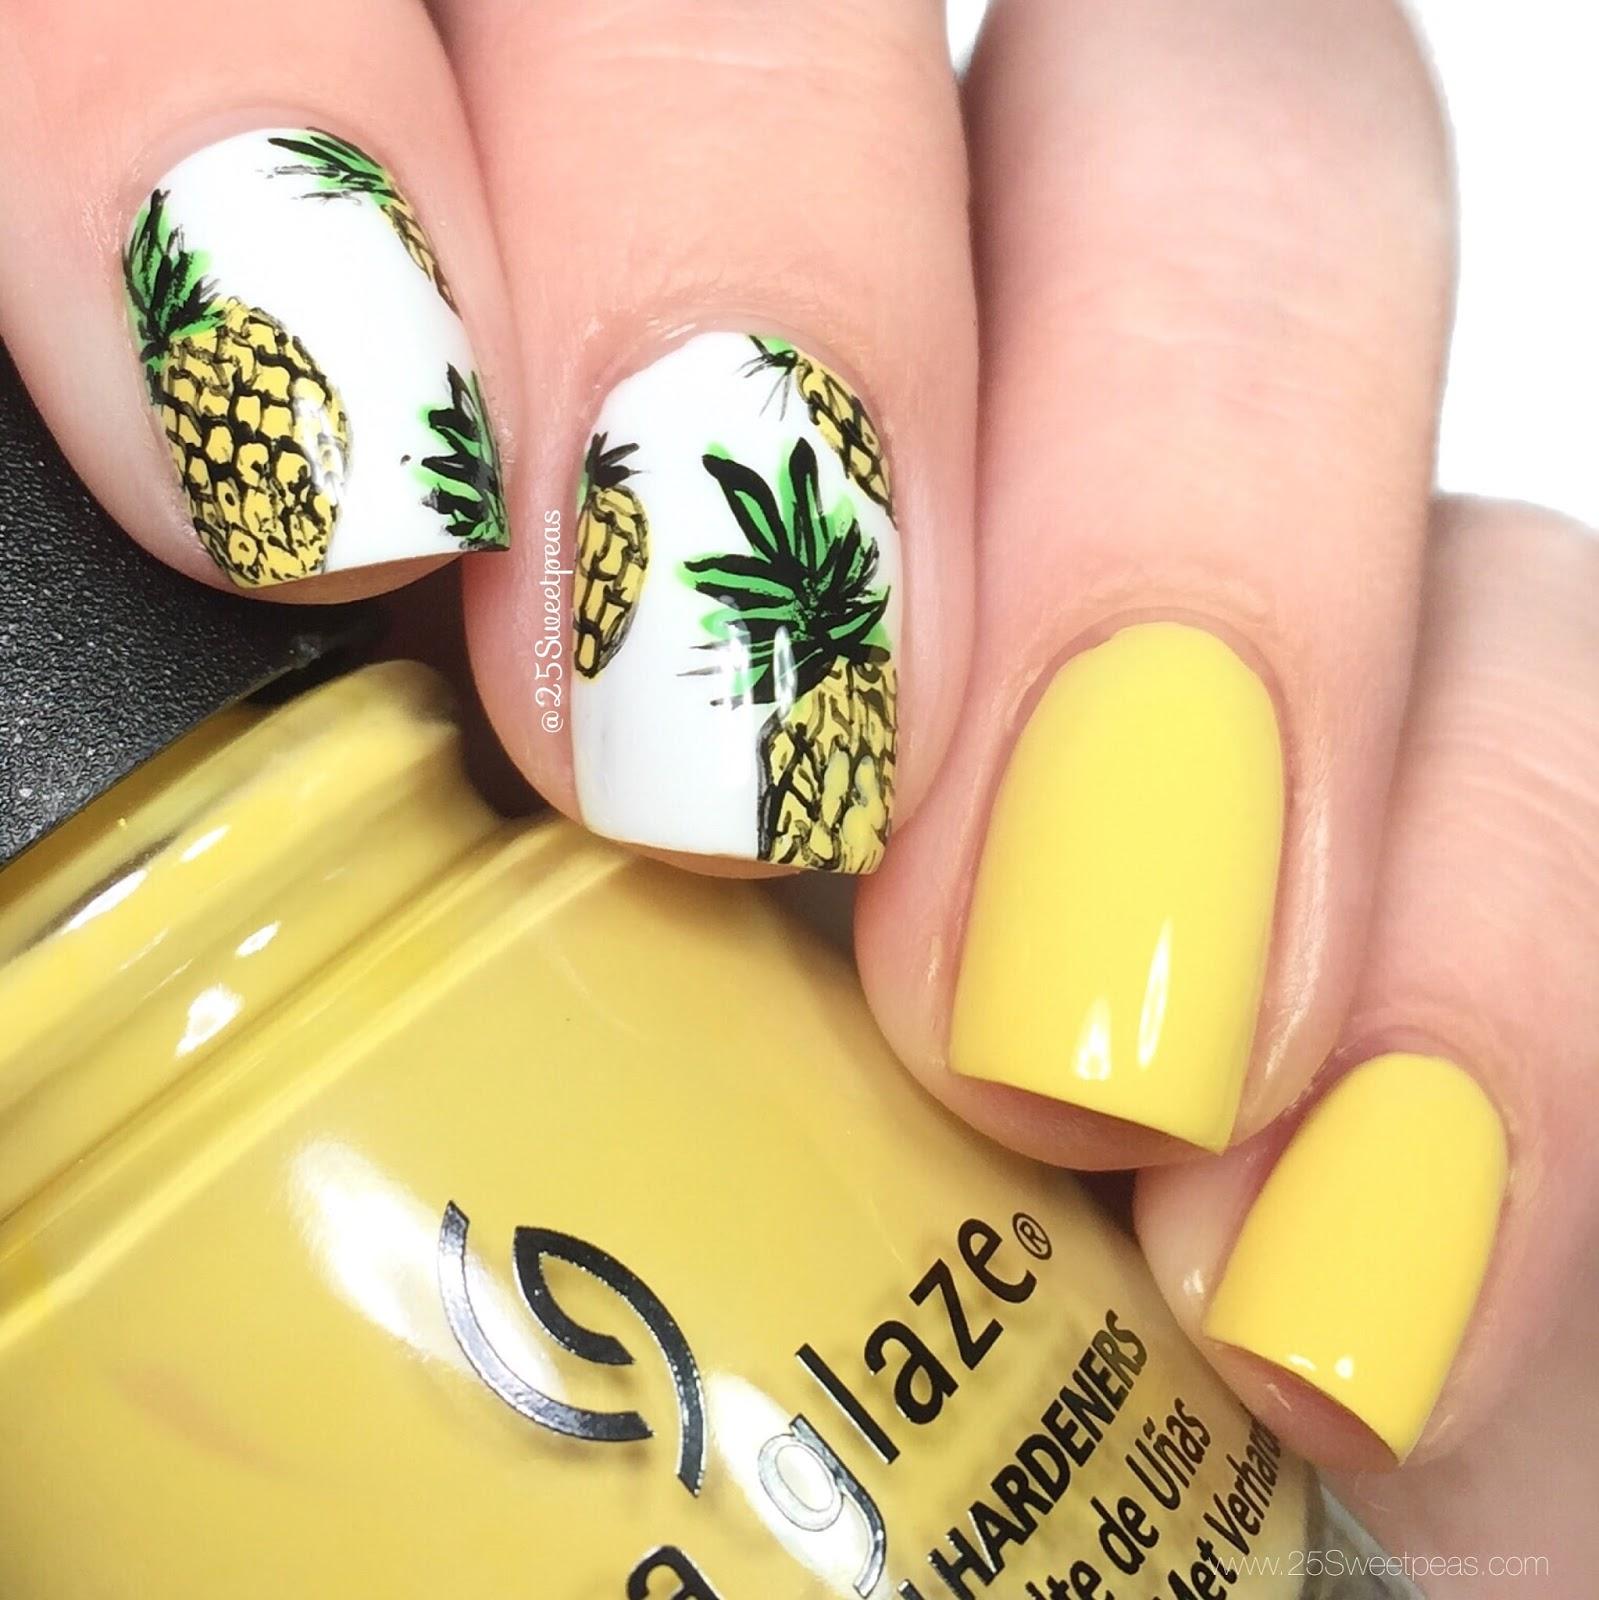 Pineapple Nail Art - Freehanded Stamped Pineapple Nail Art & Tutorial - 25 Sweetpeas